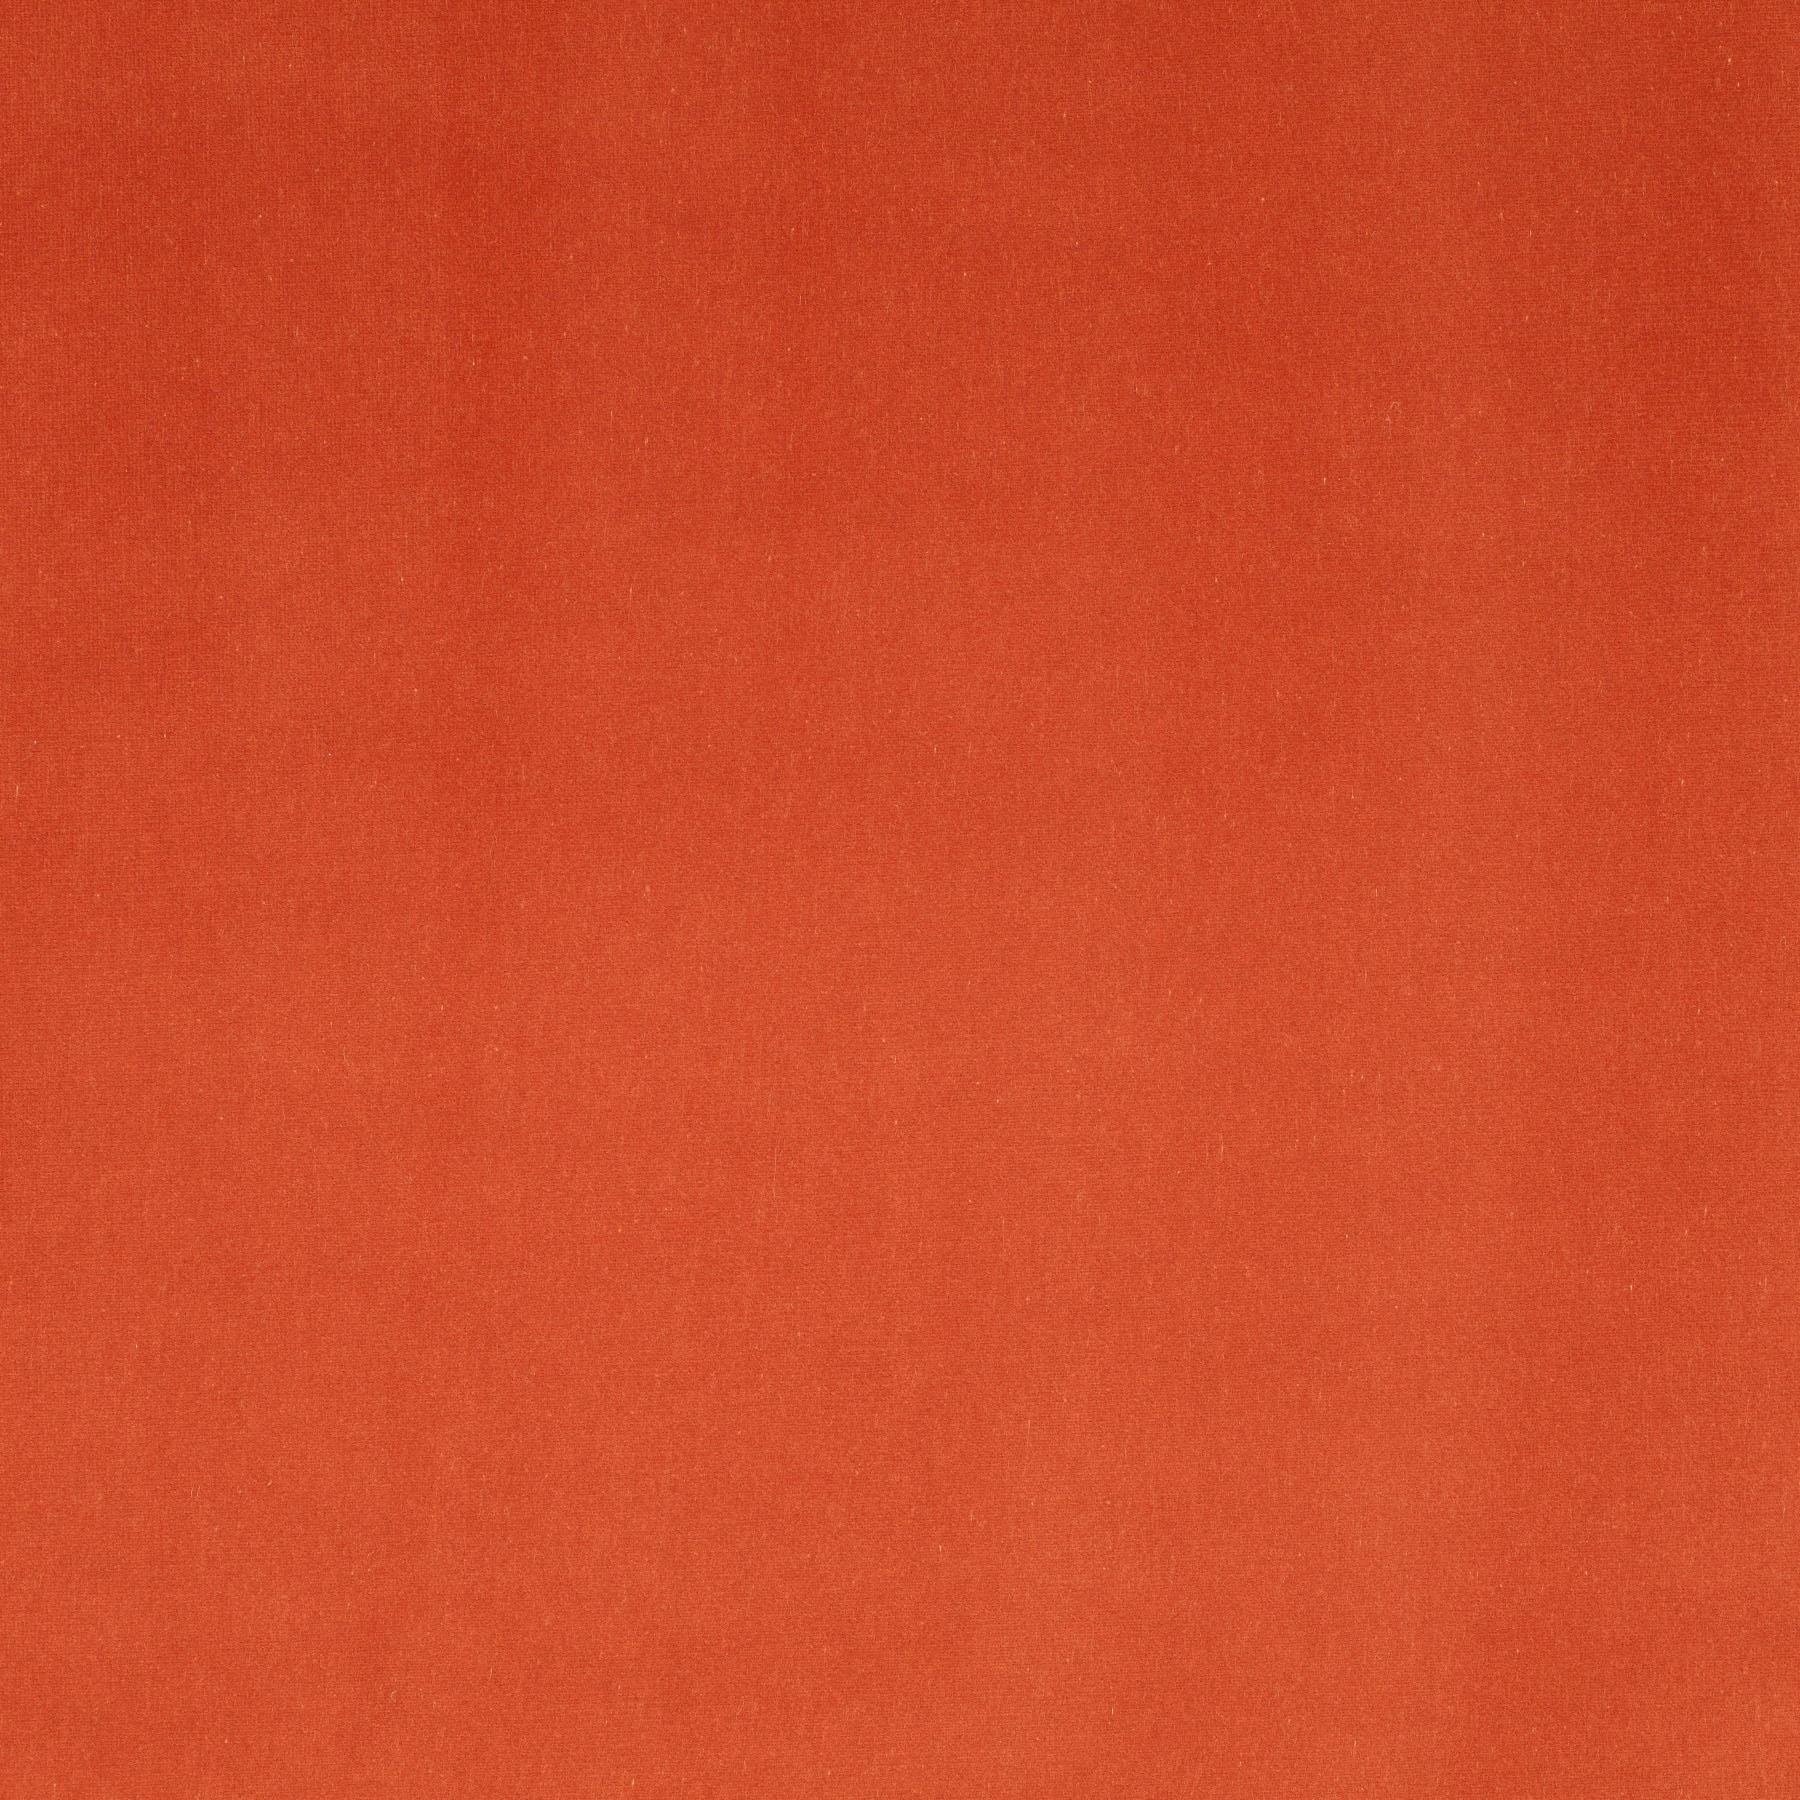 Upholstery Fabric The Colour Velvet Vol Ii Ch1912 061